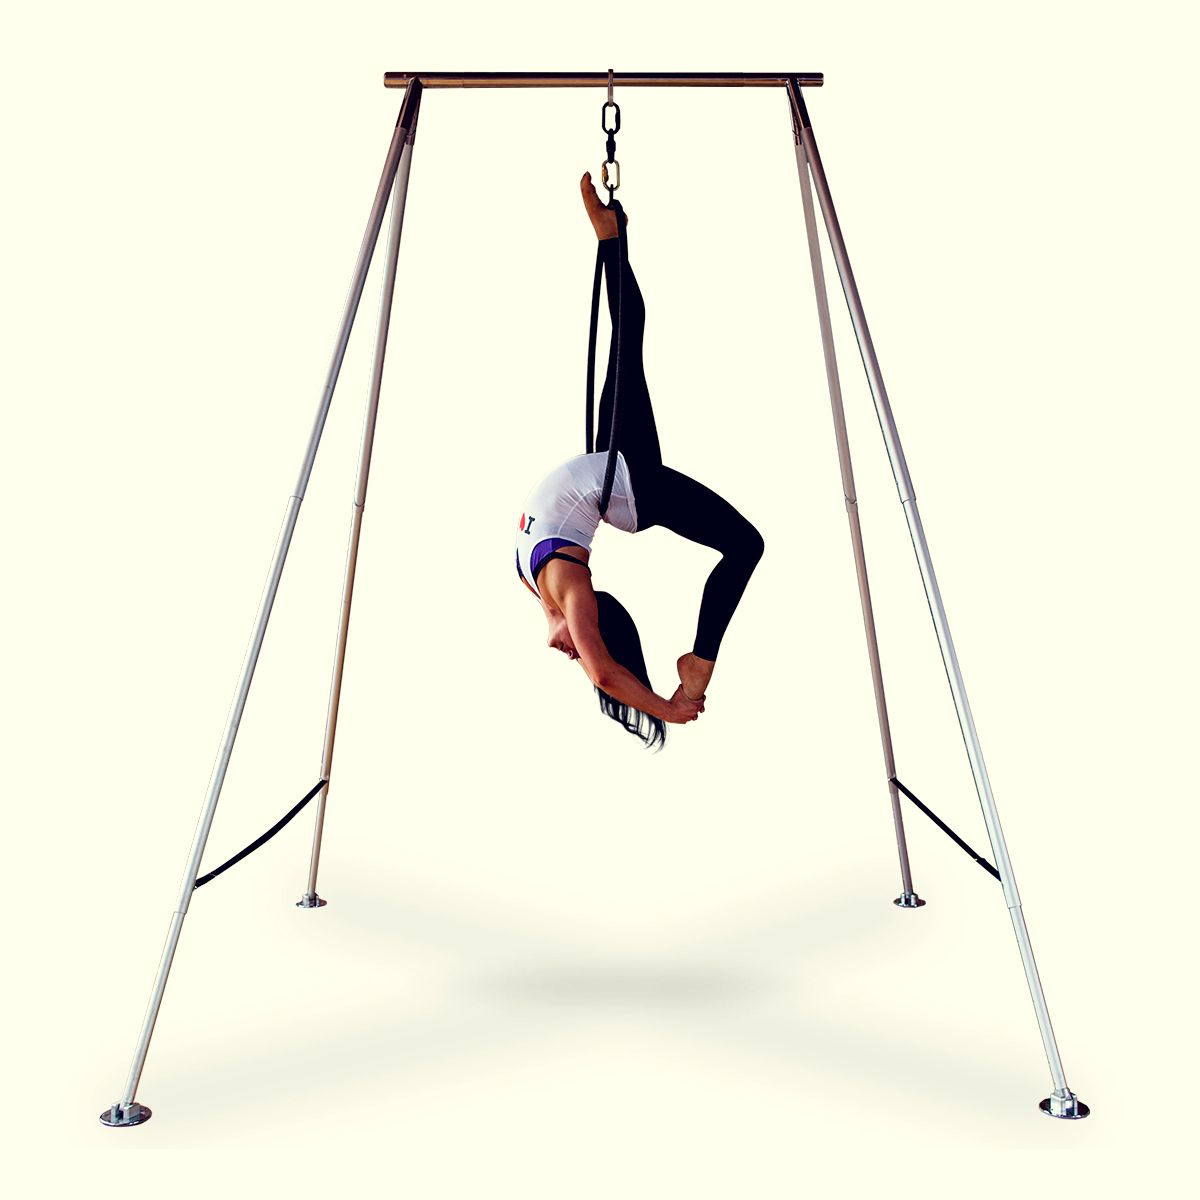 Xpole portable aframe for lyra silks u aerial yoga aerial yoga